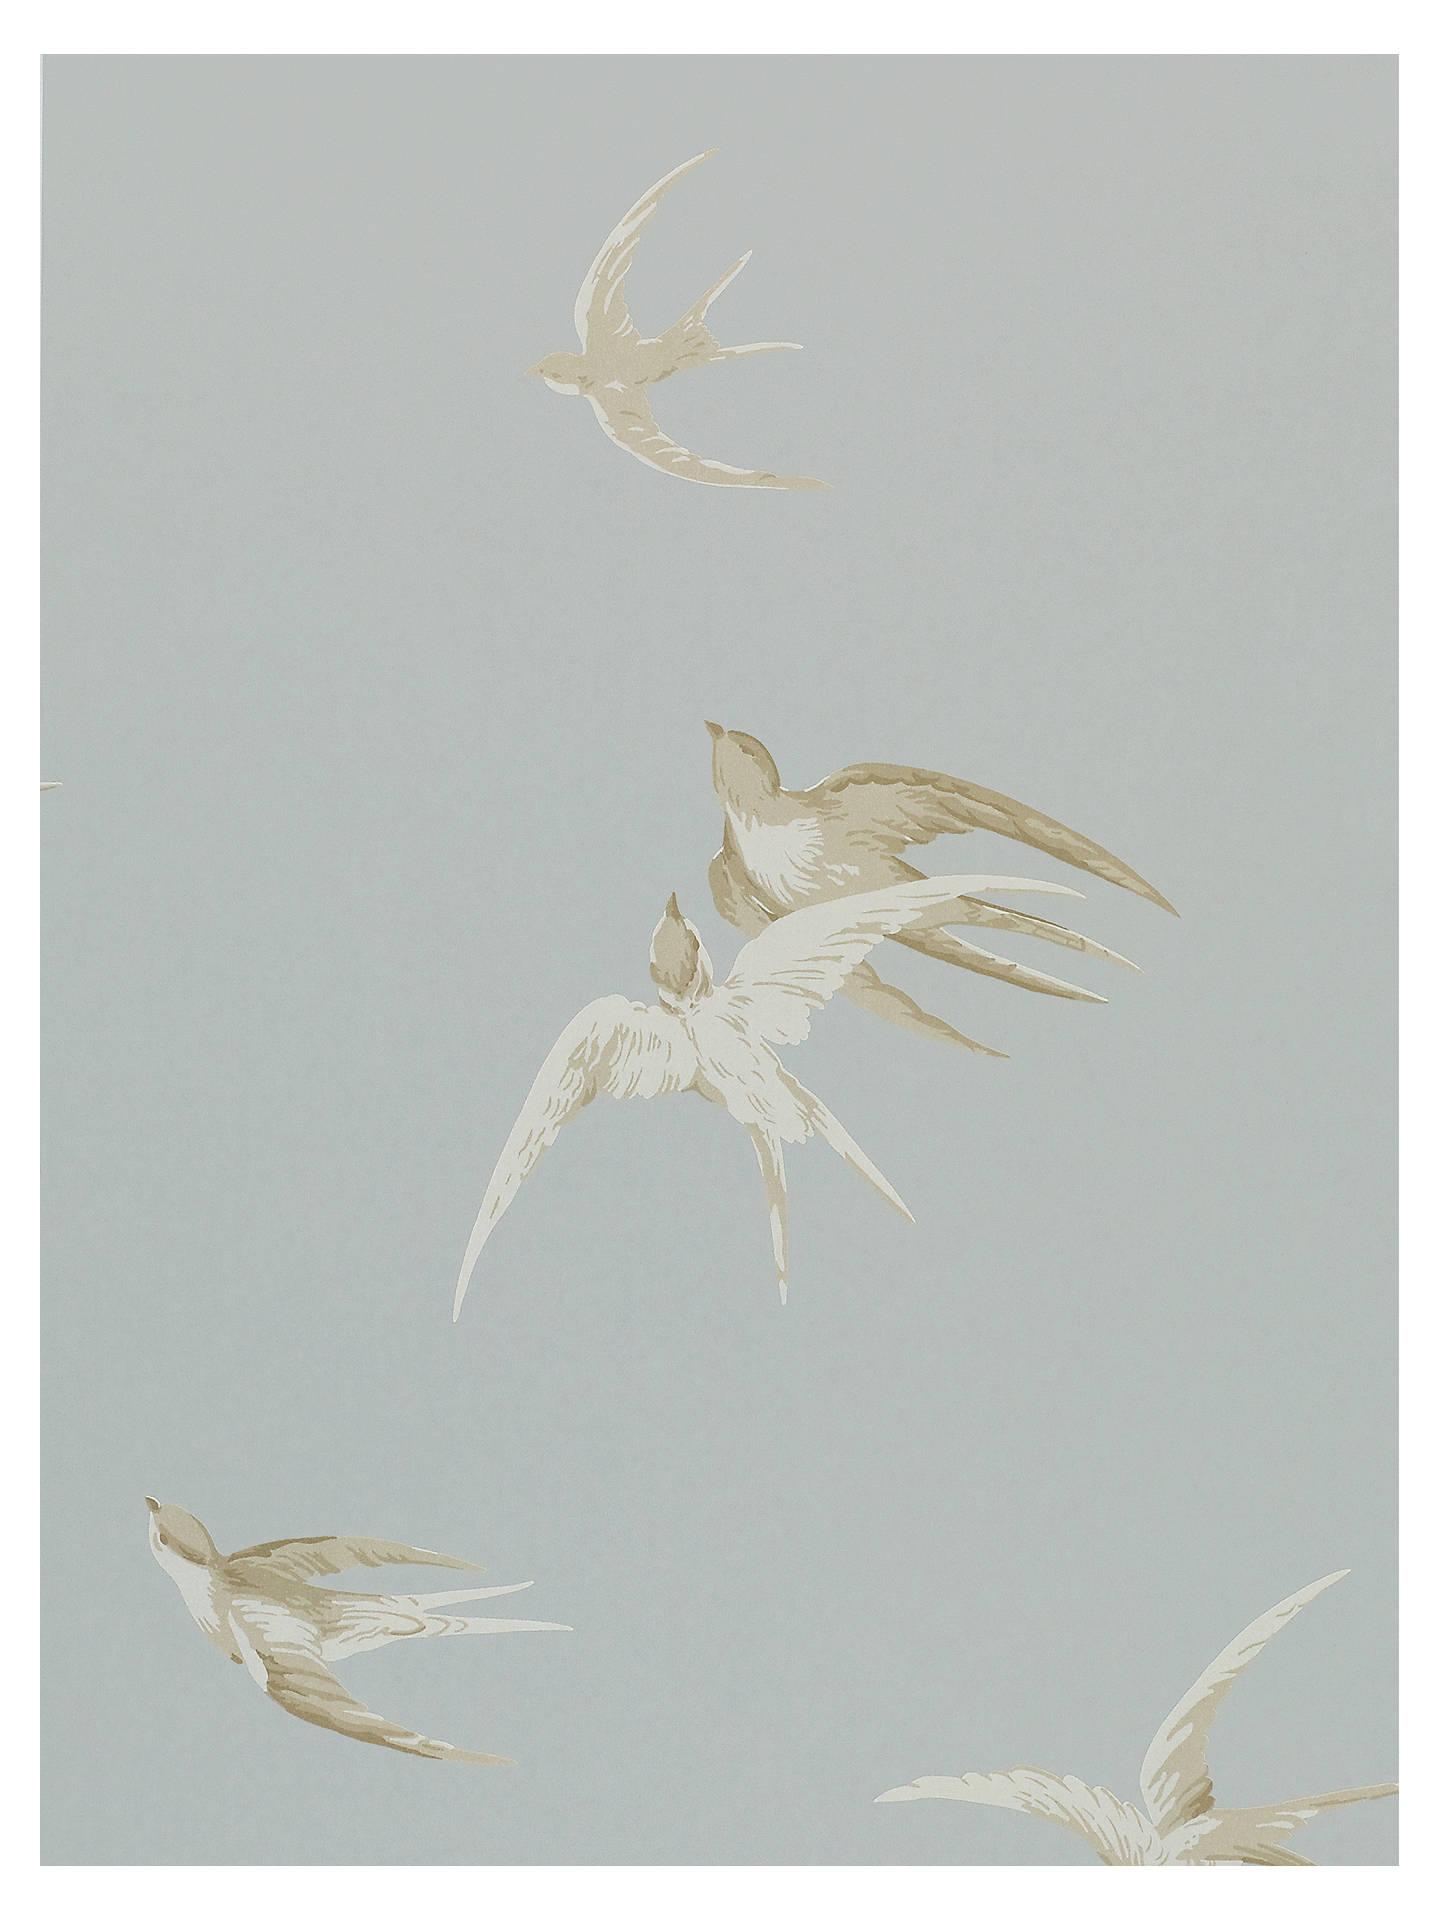 Buy Sanderson Swallows Wallpaper, Silver, DVIWSW104 Online at johnlewis.com ...